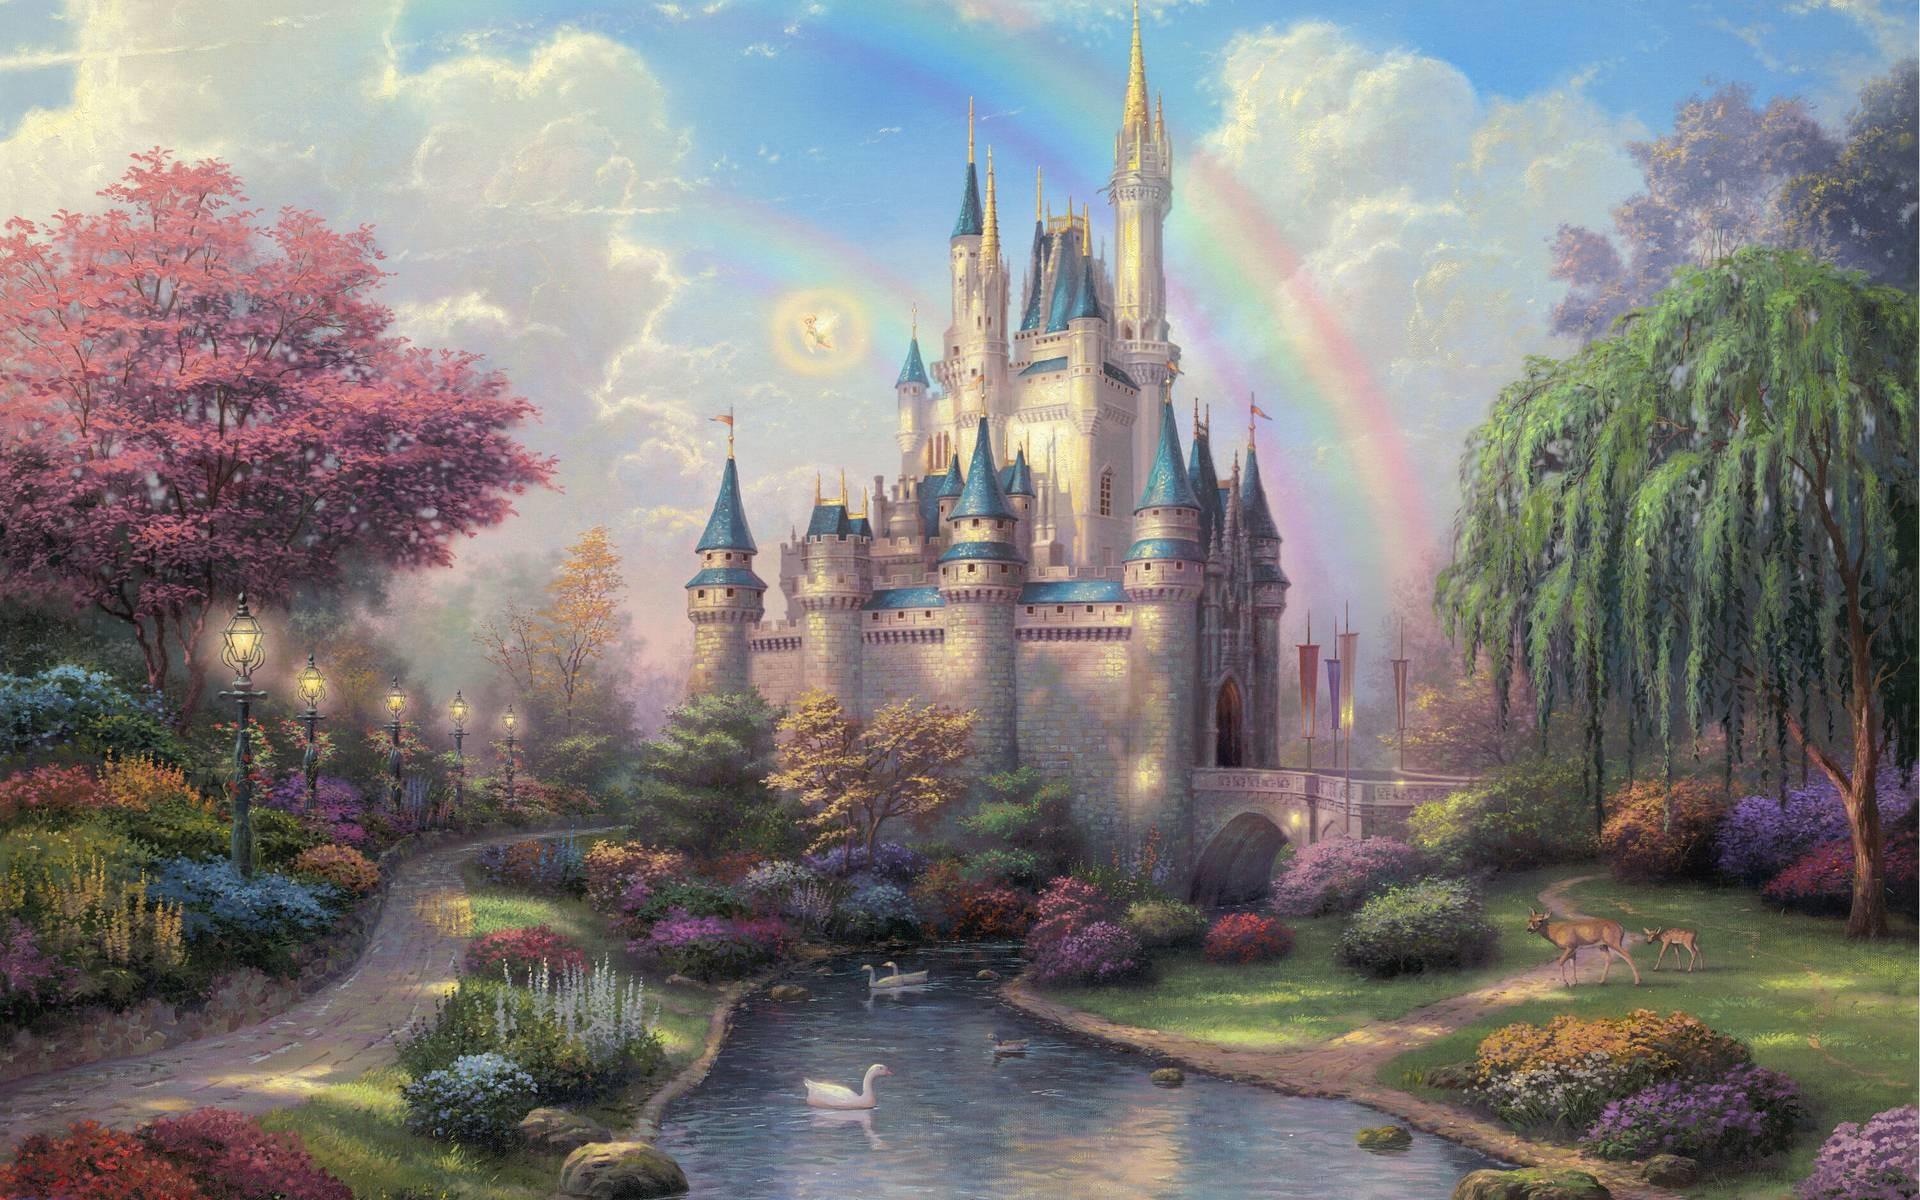 Thomas Kinkade Disneyland 50th Anniversary Wallpaper Art Painings